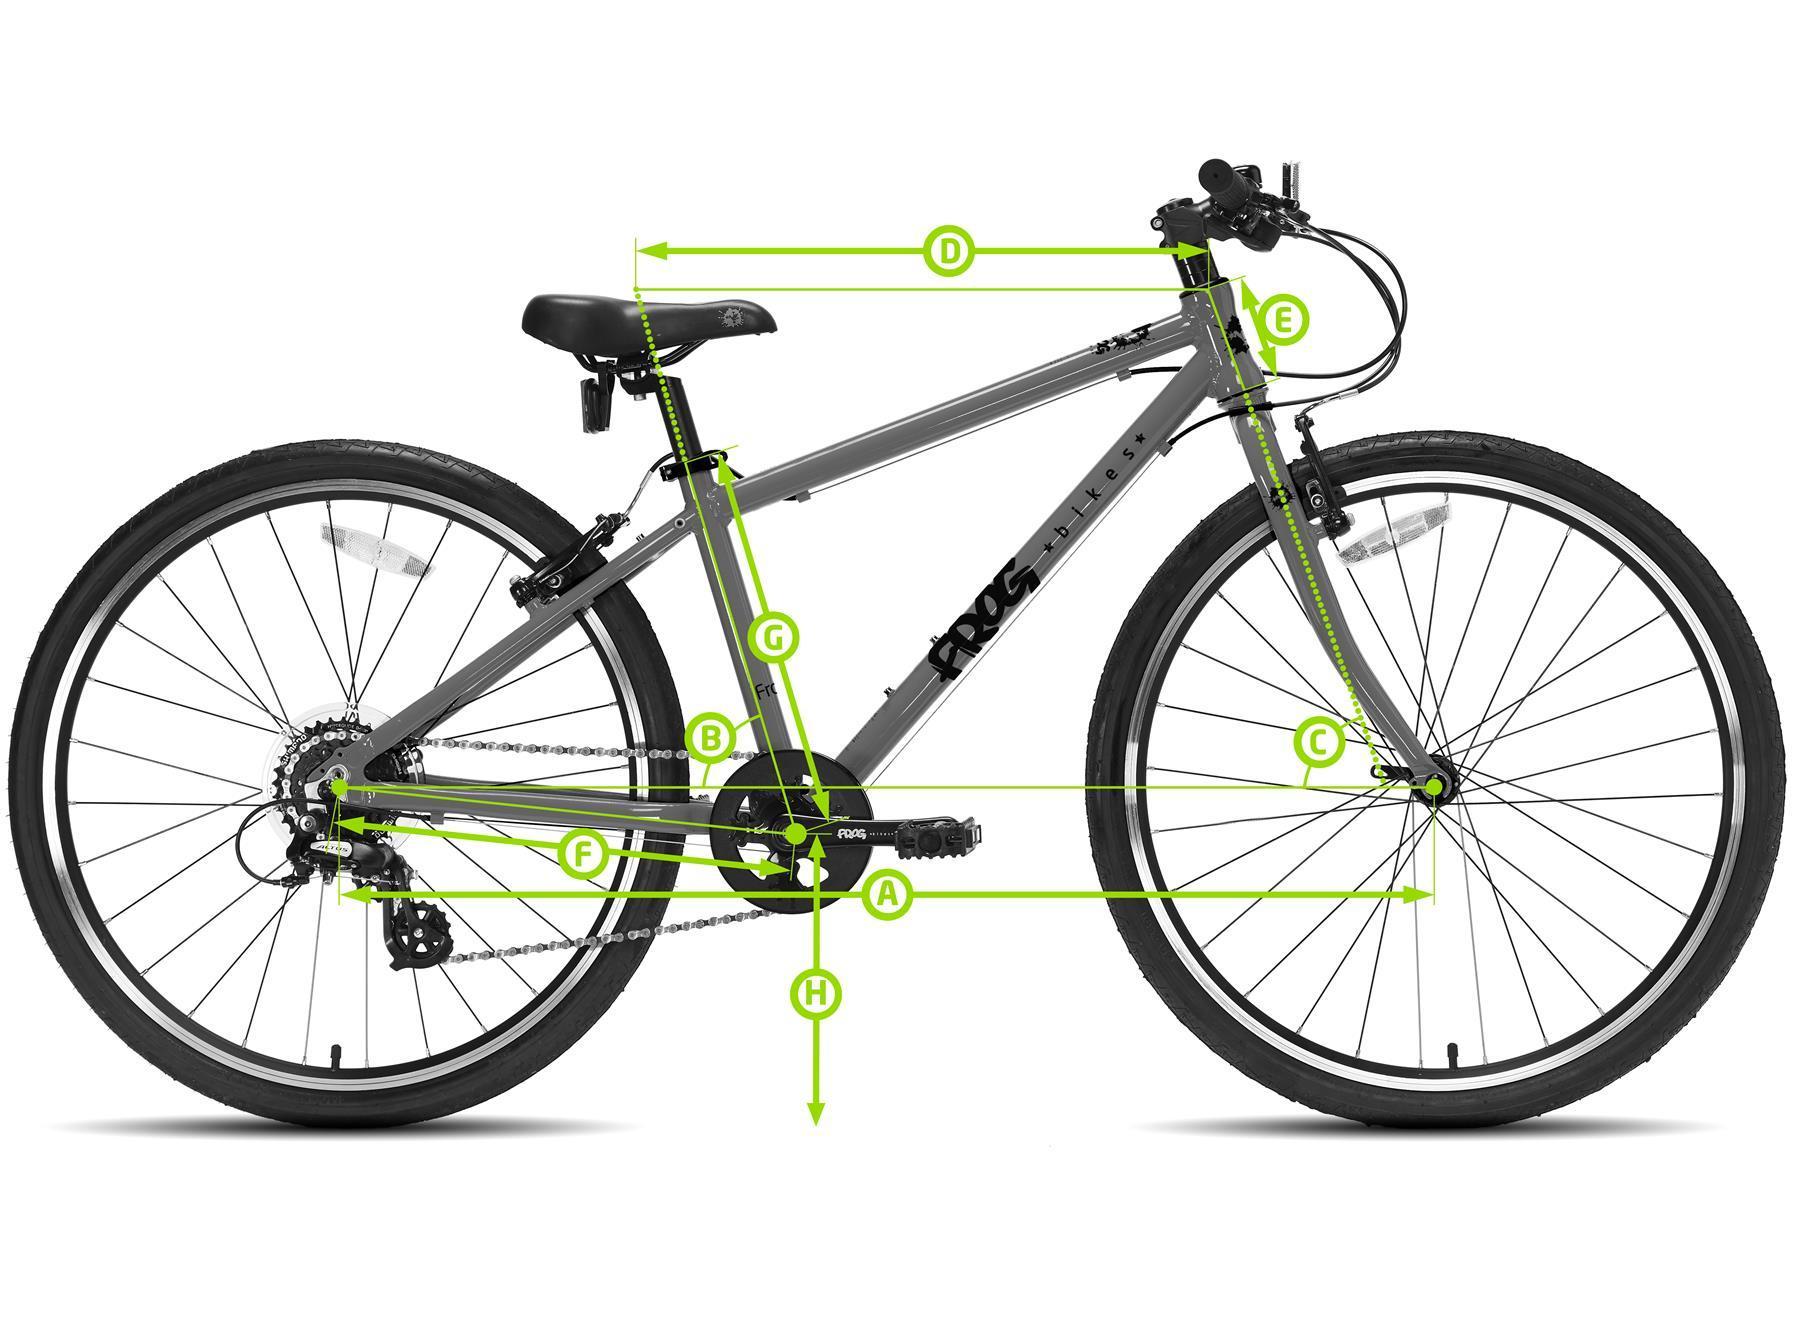 Frog First Pedal 52 Bike Geometry